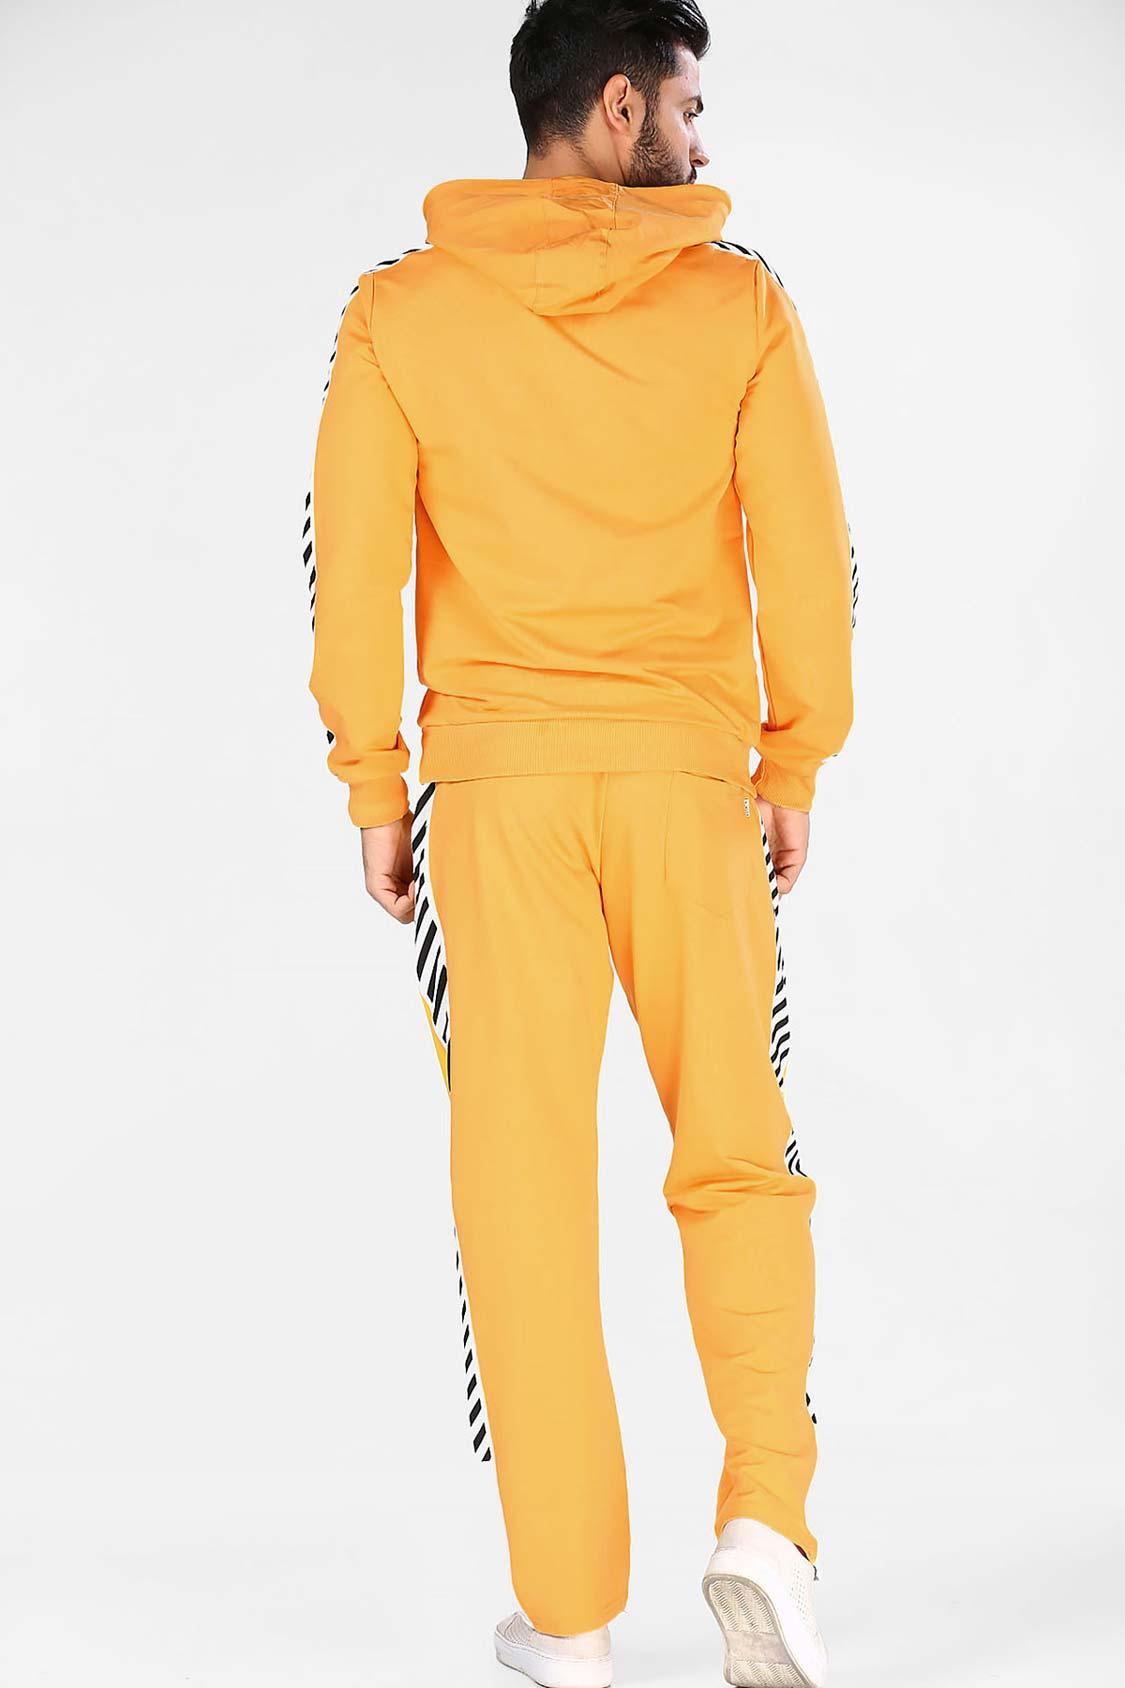 Men's Printed Yellow Sweat Suit